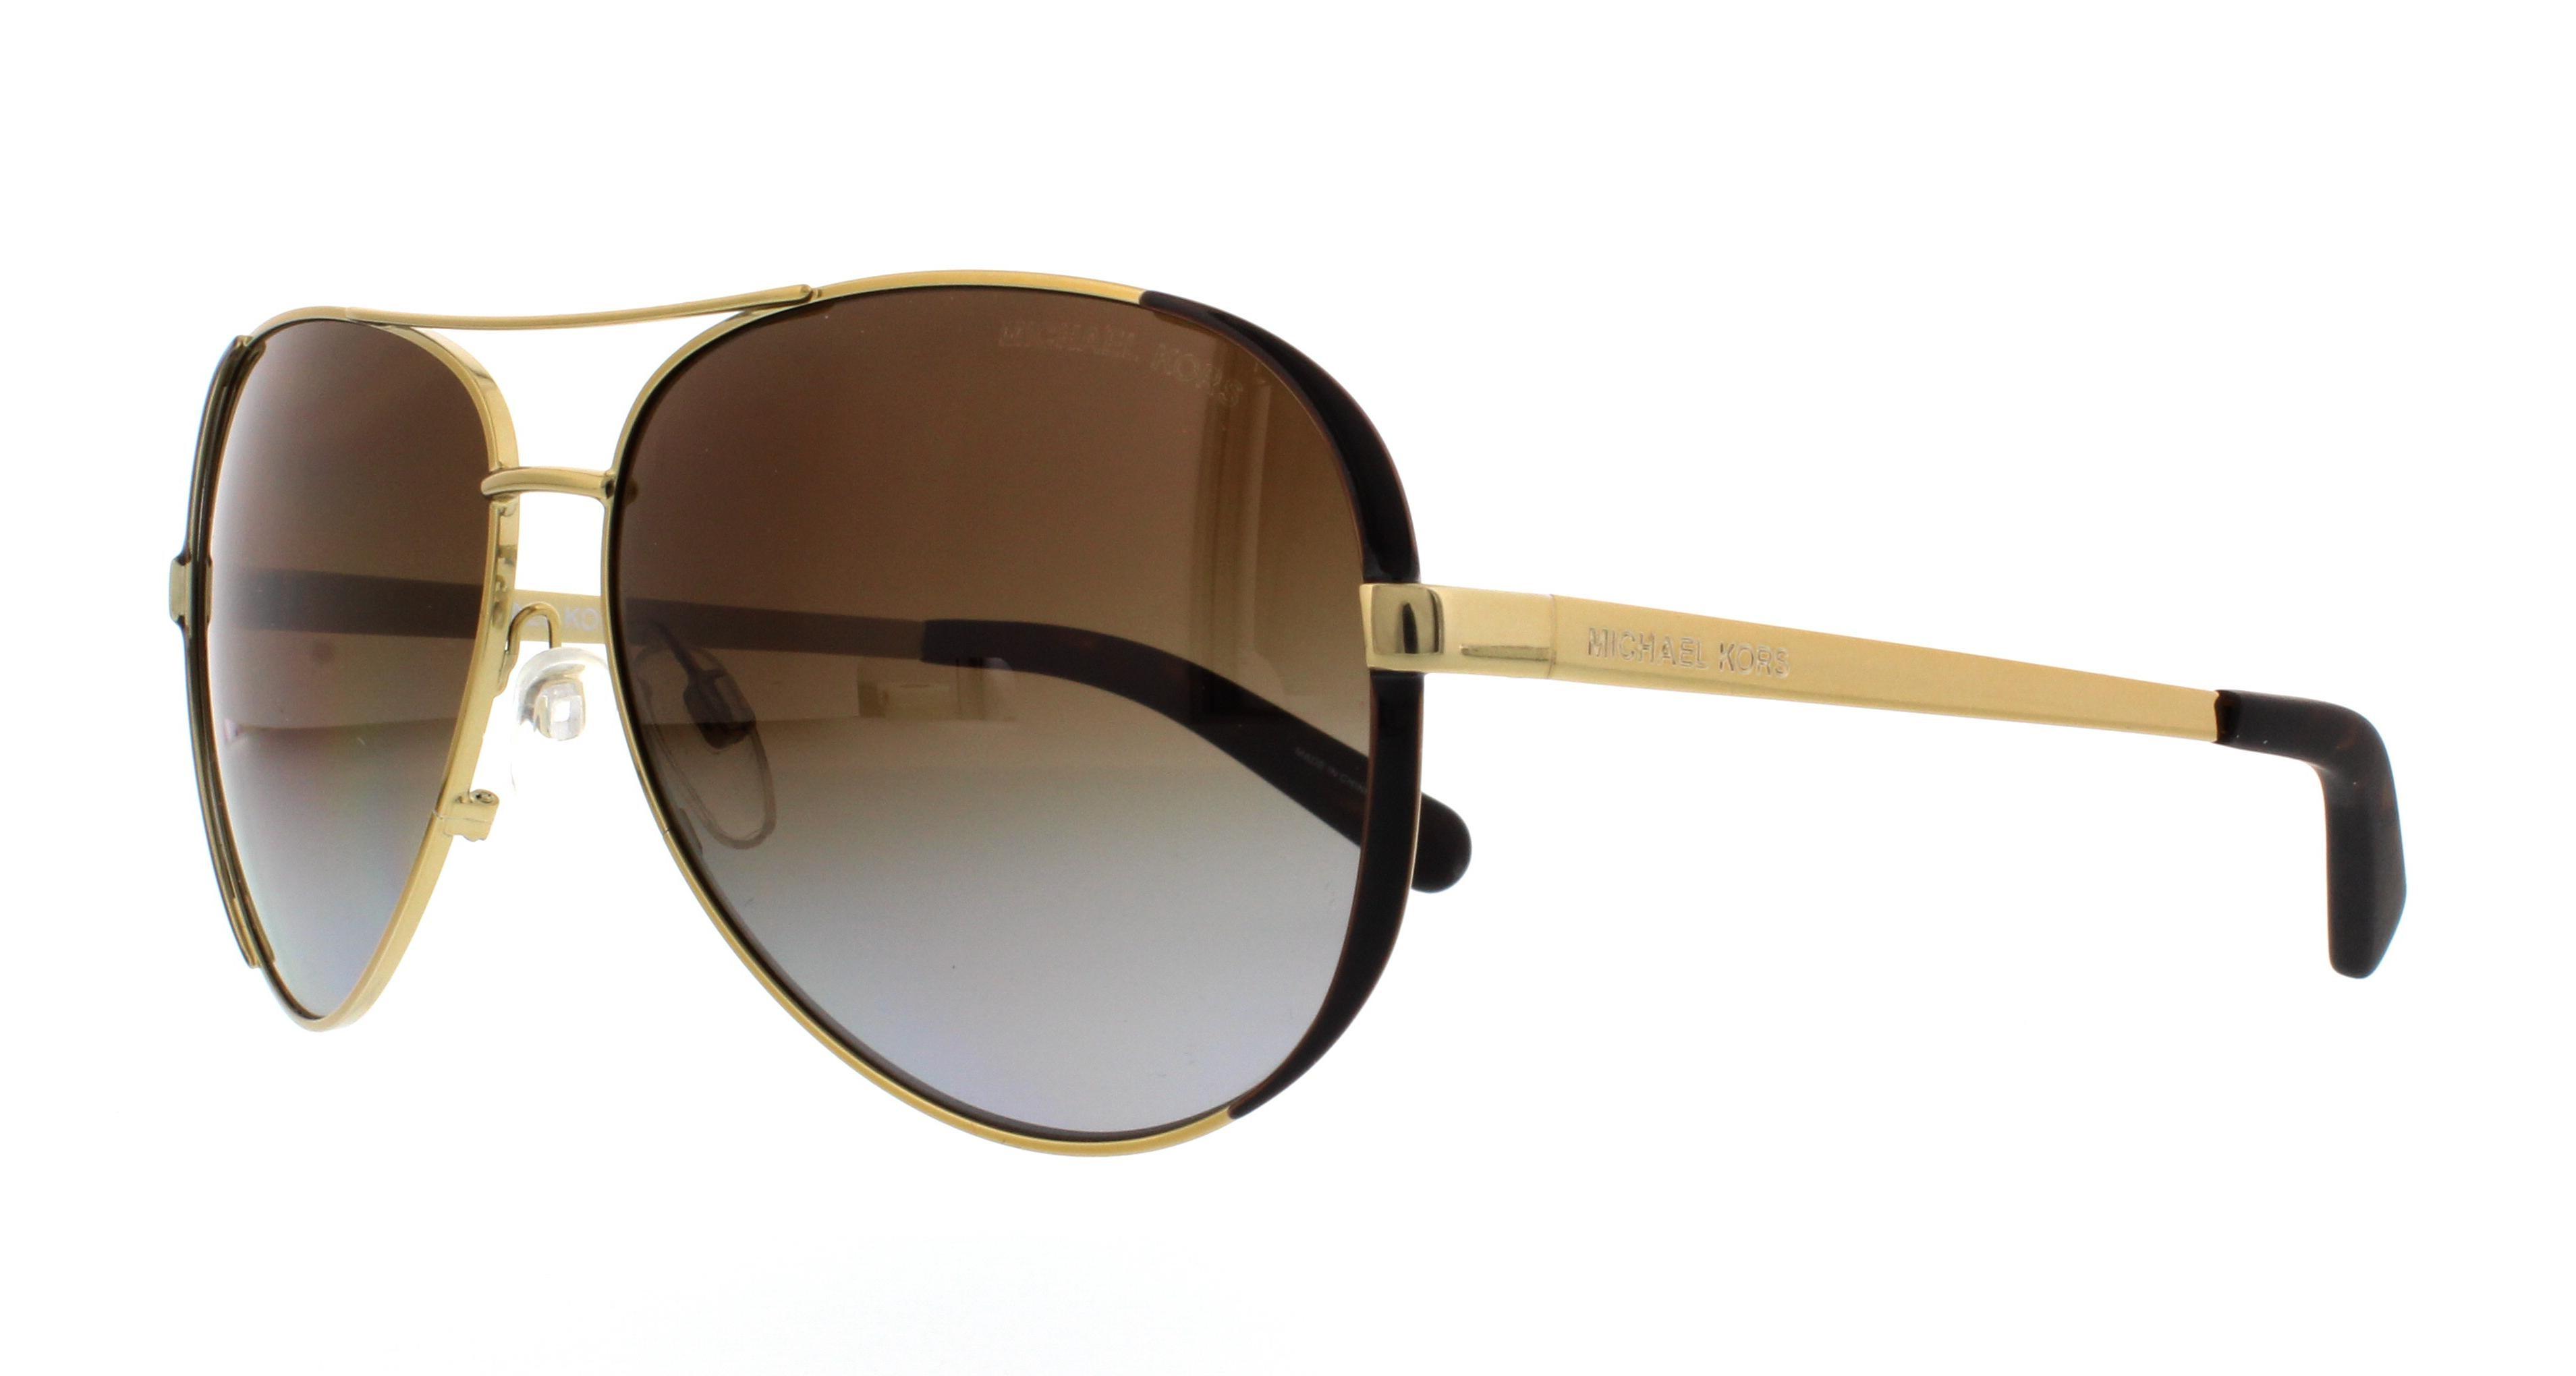 Michael Kors Chelsea Sonnenbrille Gold 1014T5 Polarisiert 59mm kCsD6w85